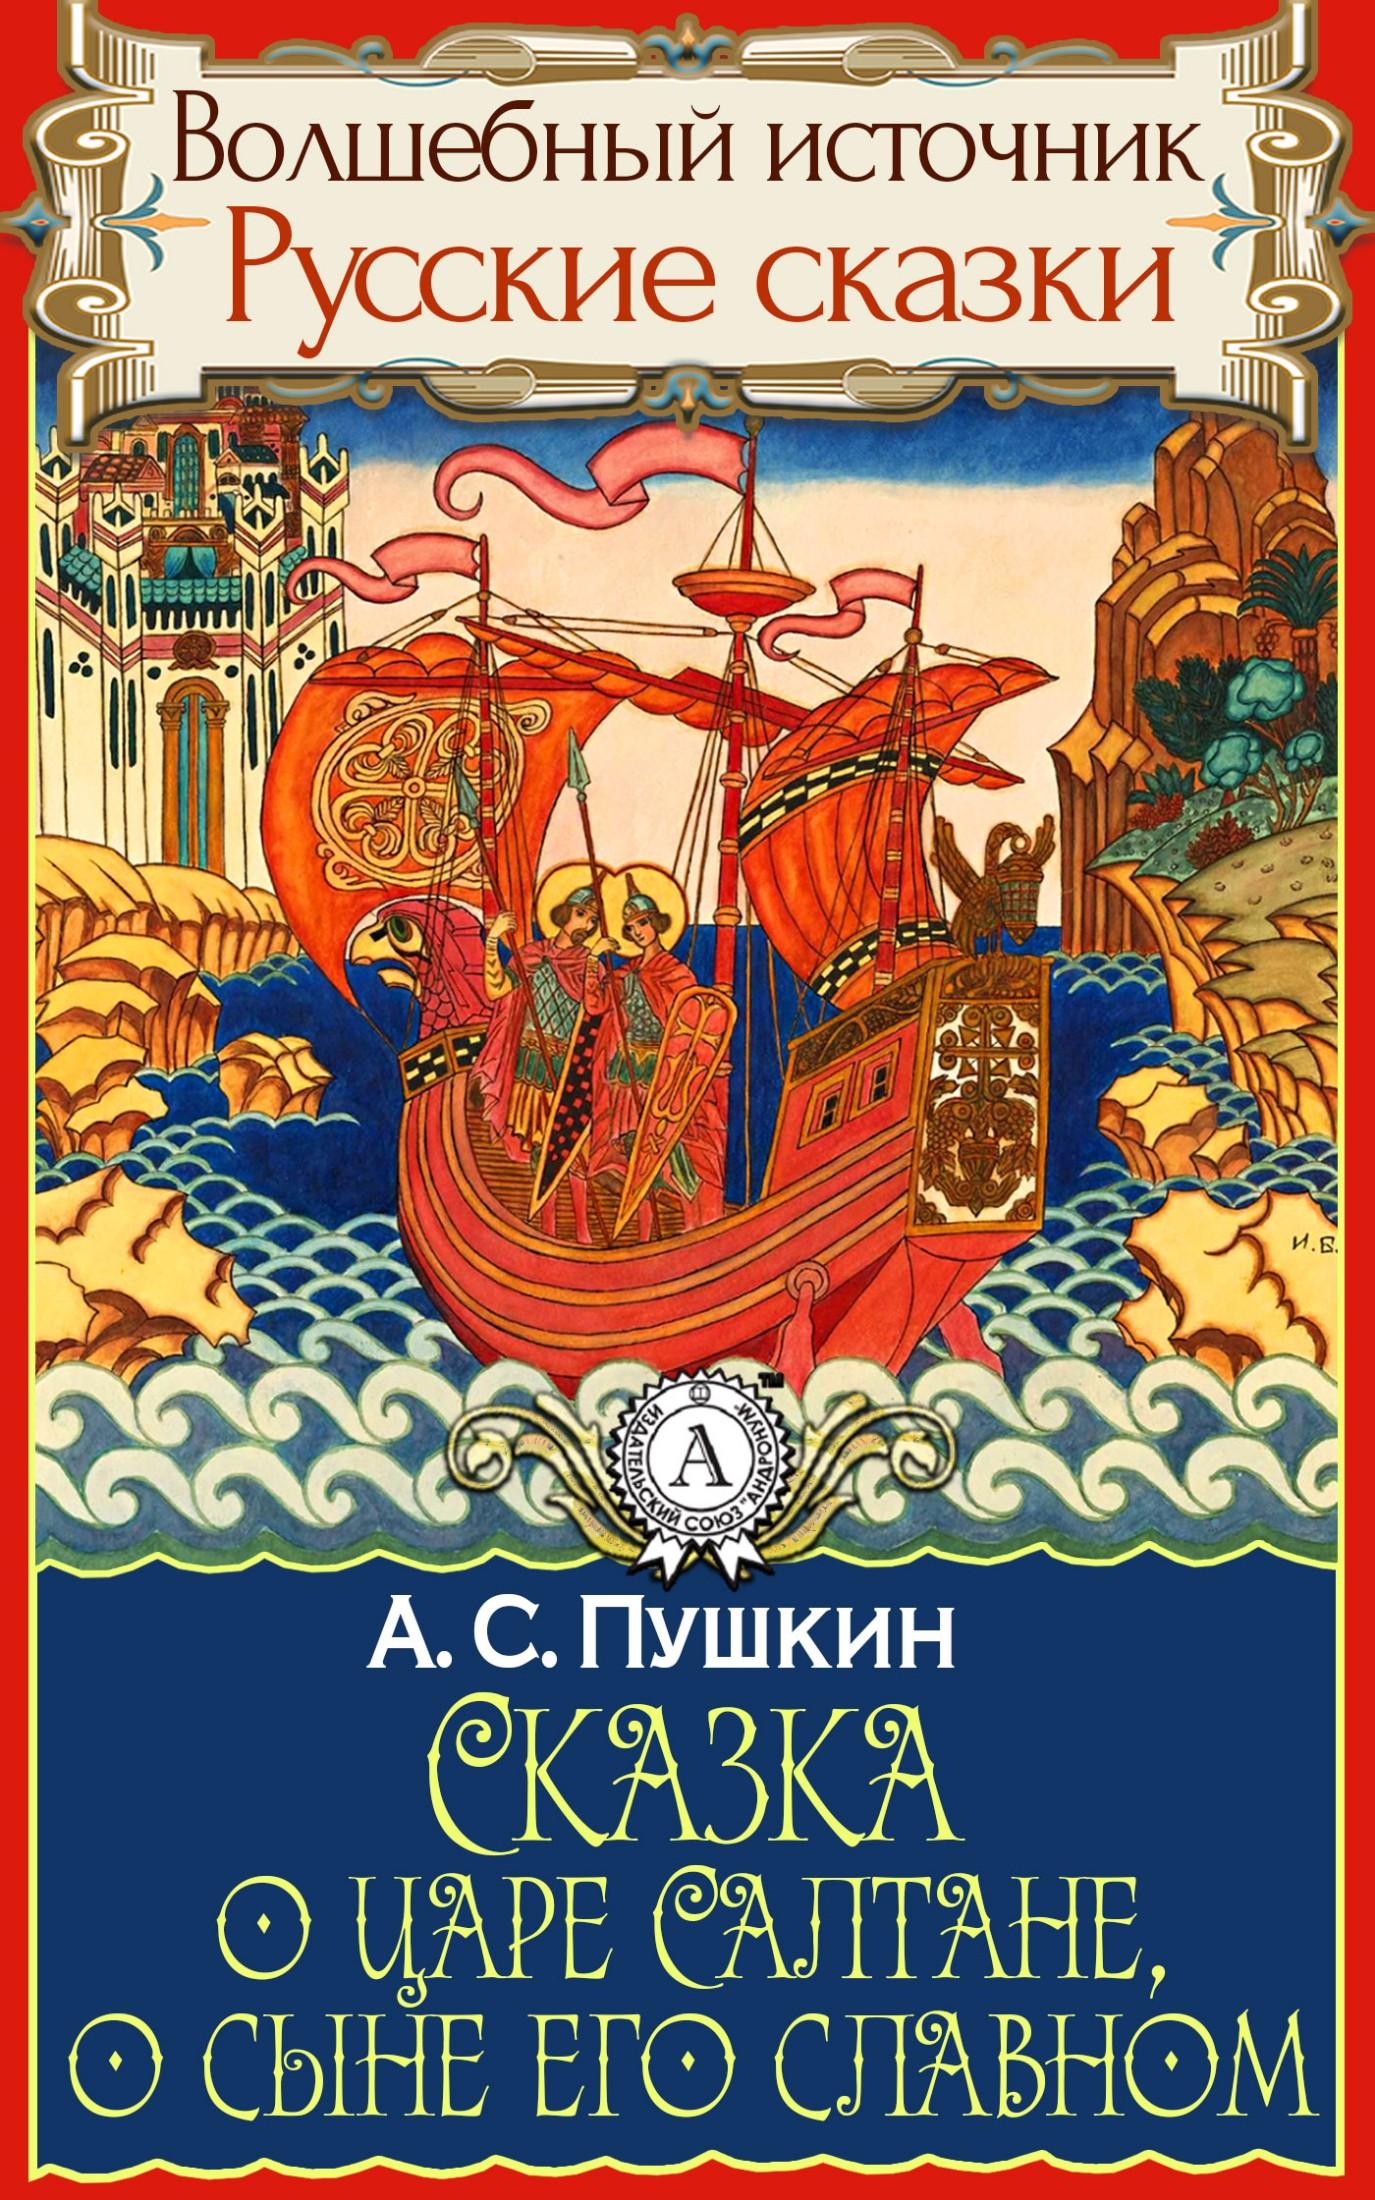 Олександр Пушкін Сказка о царе Салтане, о сыне его славном